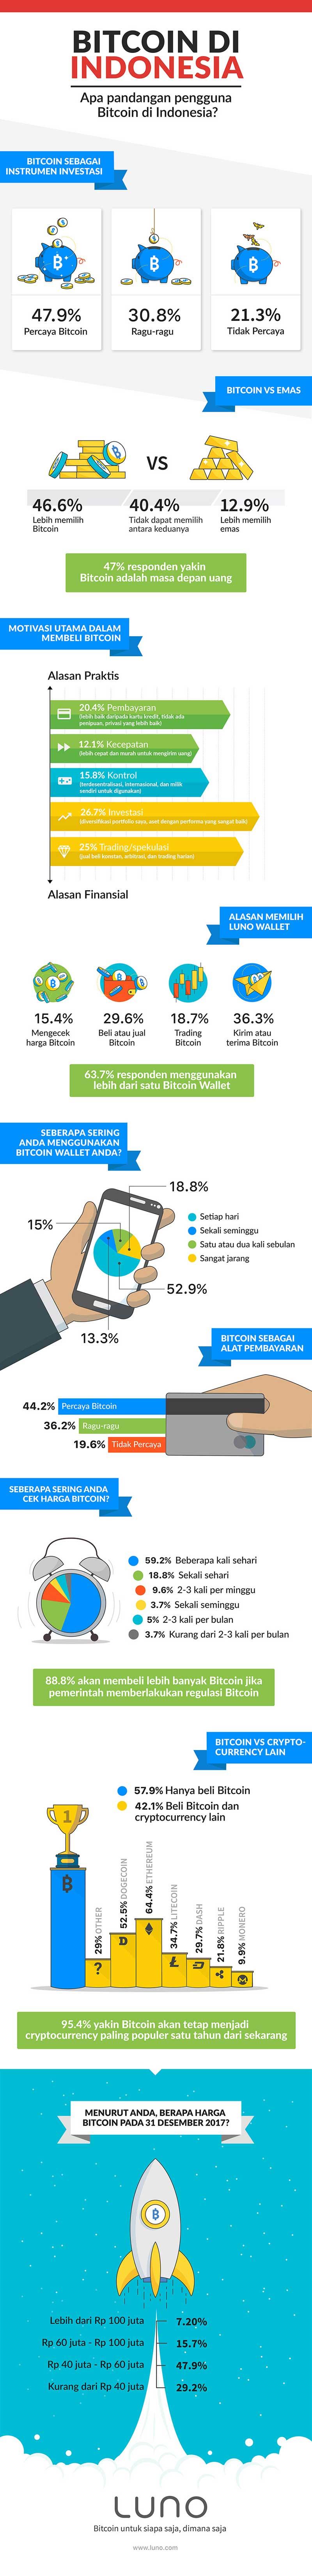 Infografis Penggunaan Bitcoin di Indonesia serta Prediksi Harga Bitcoin pada Akhir Tahun 2017 03 - Finansialku